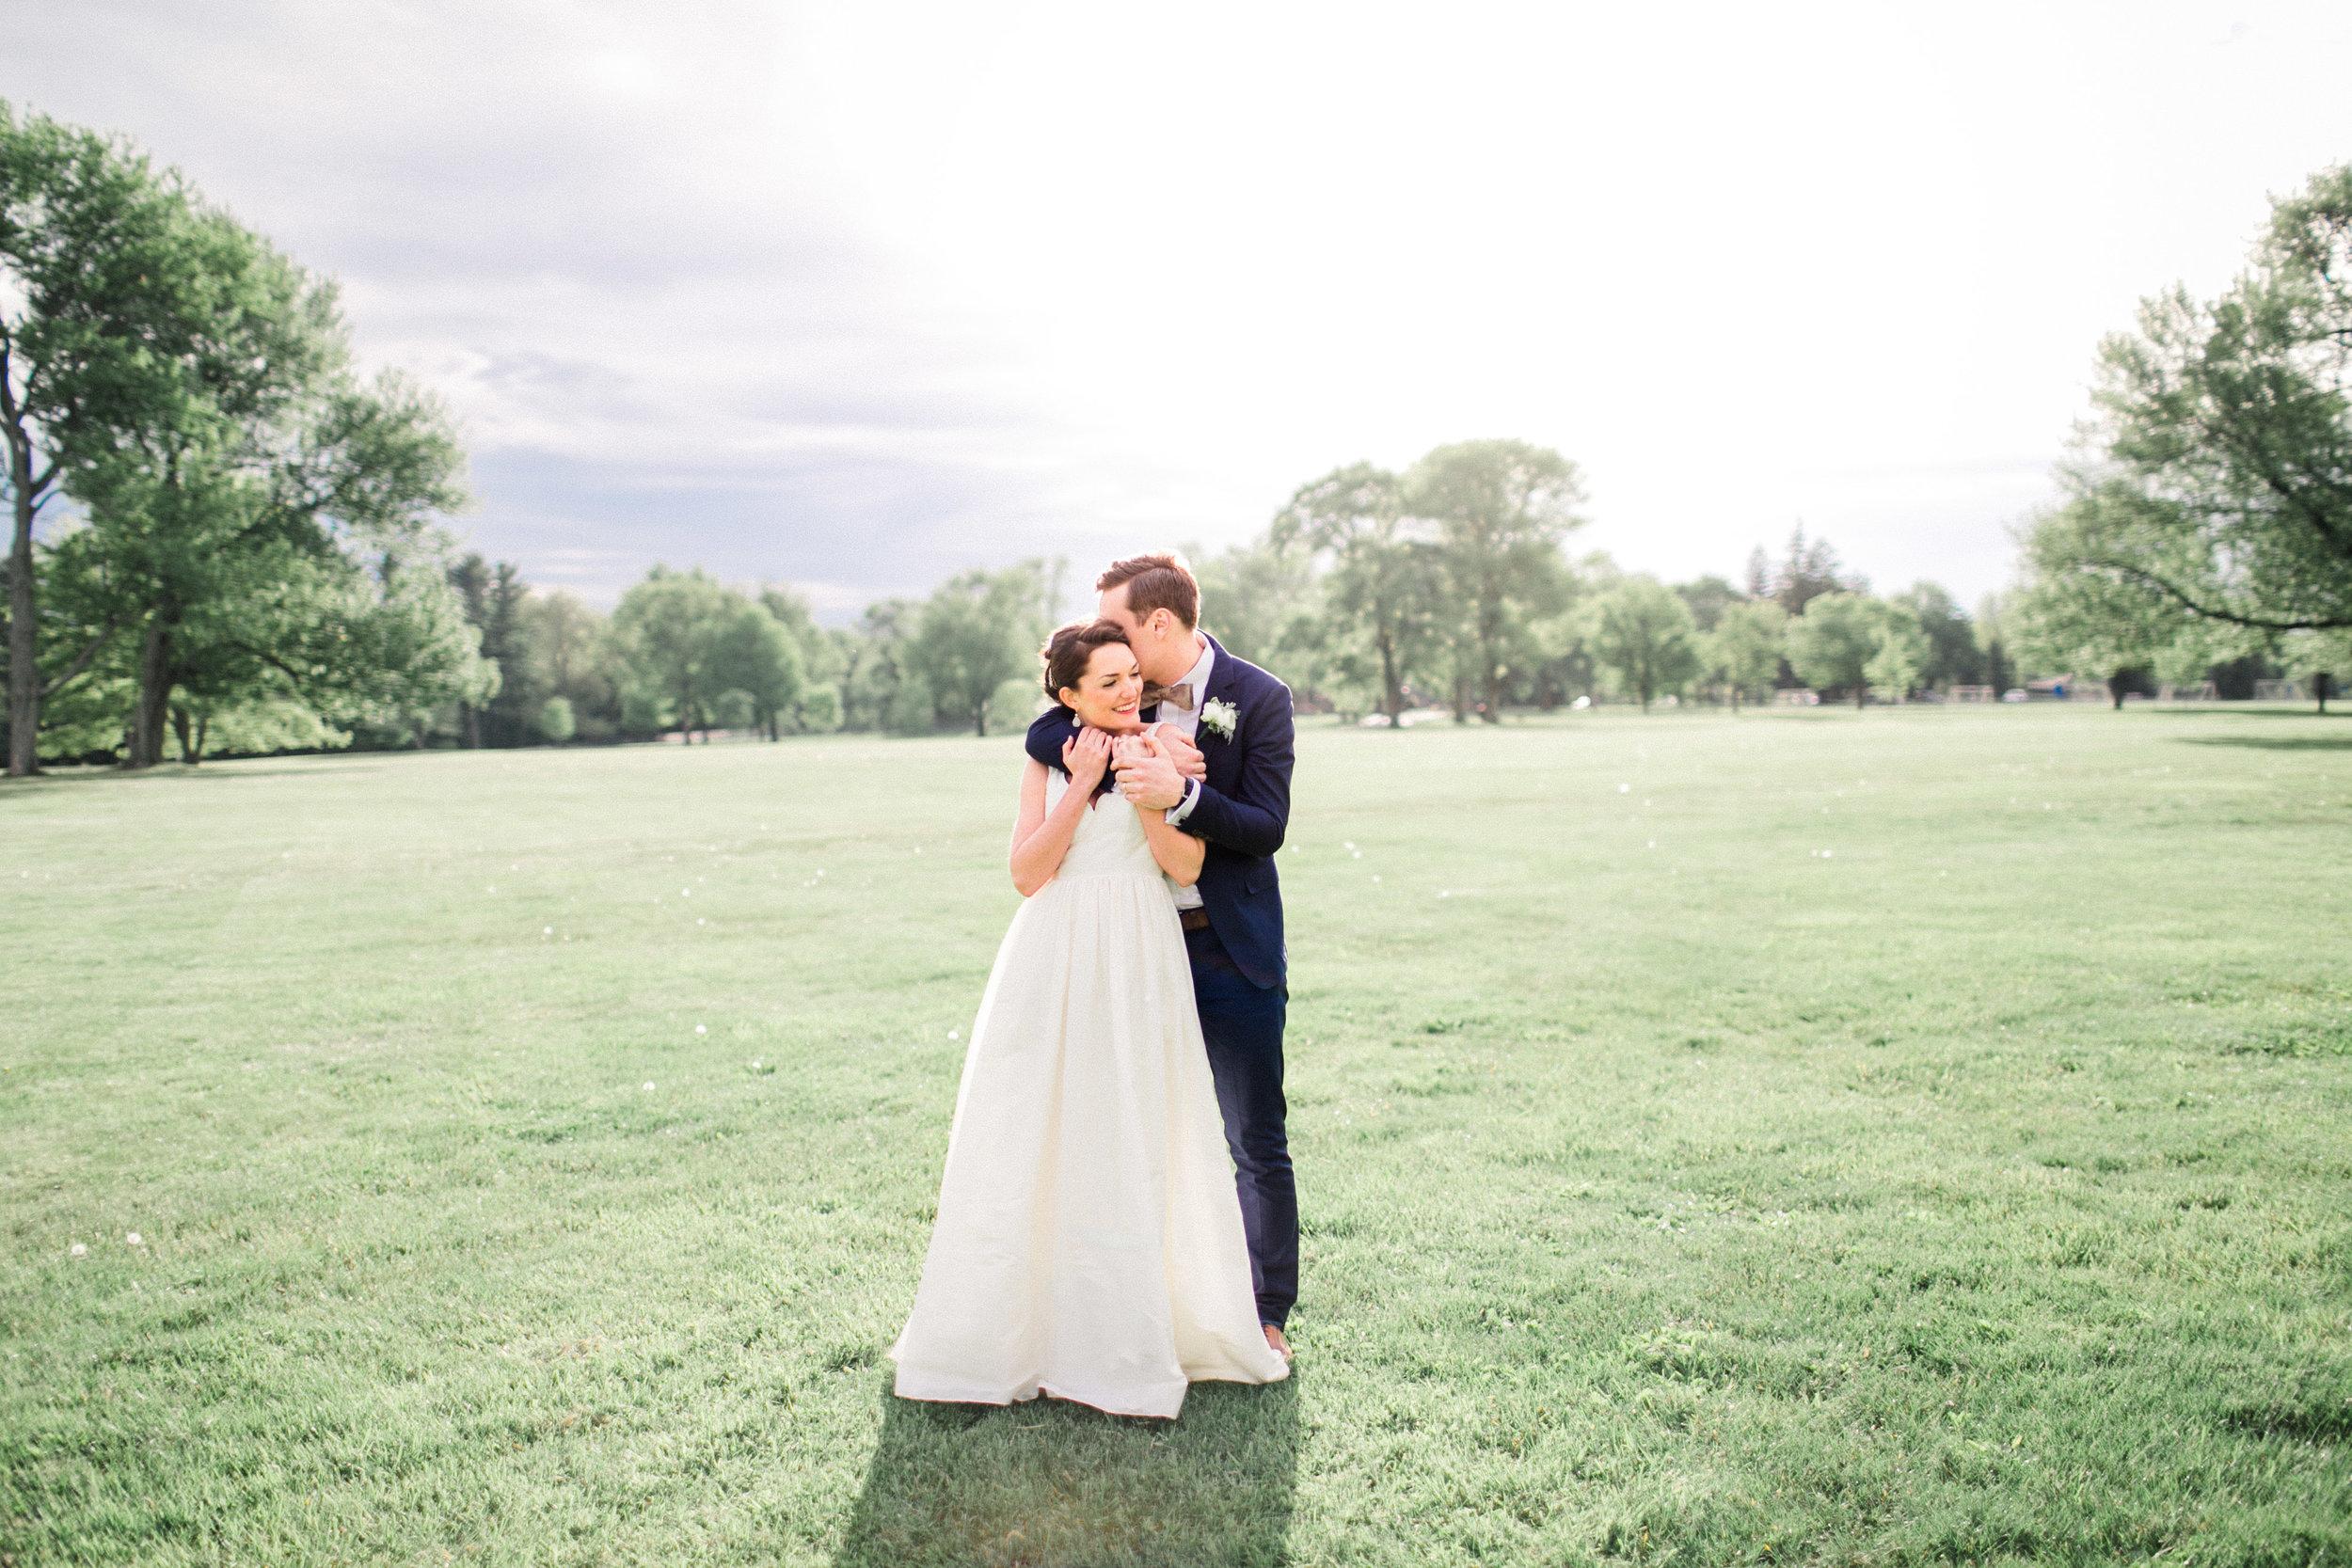 mayden photography weddings-113.jpg